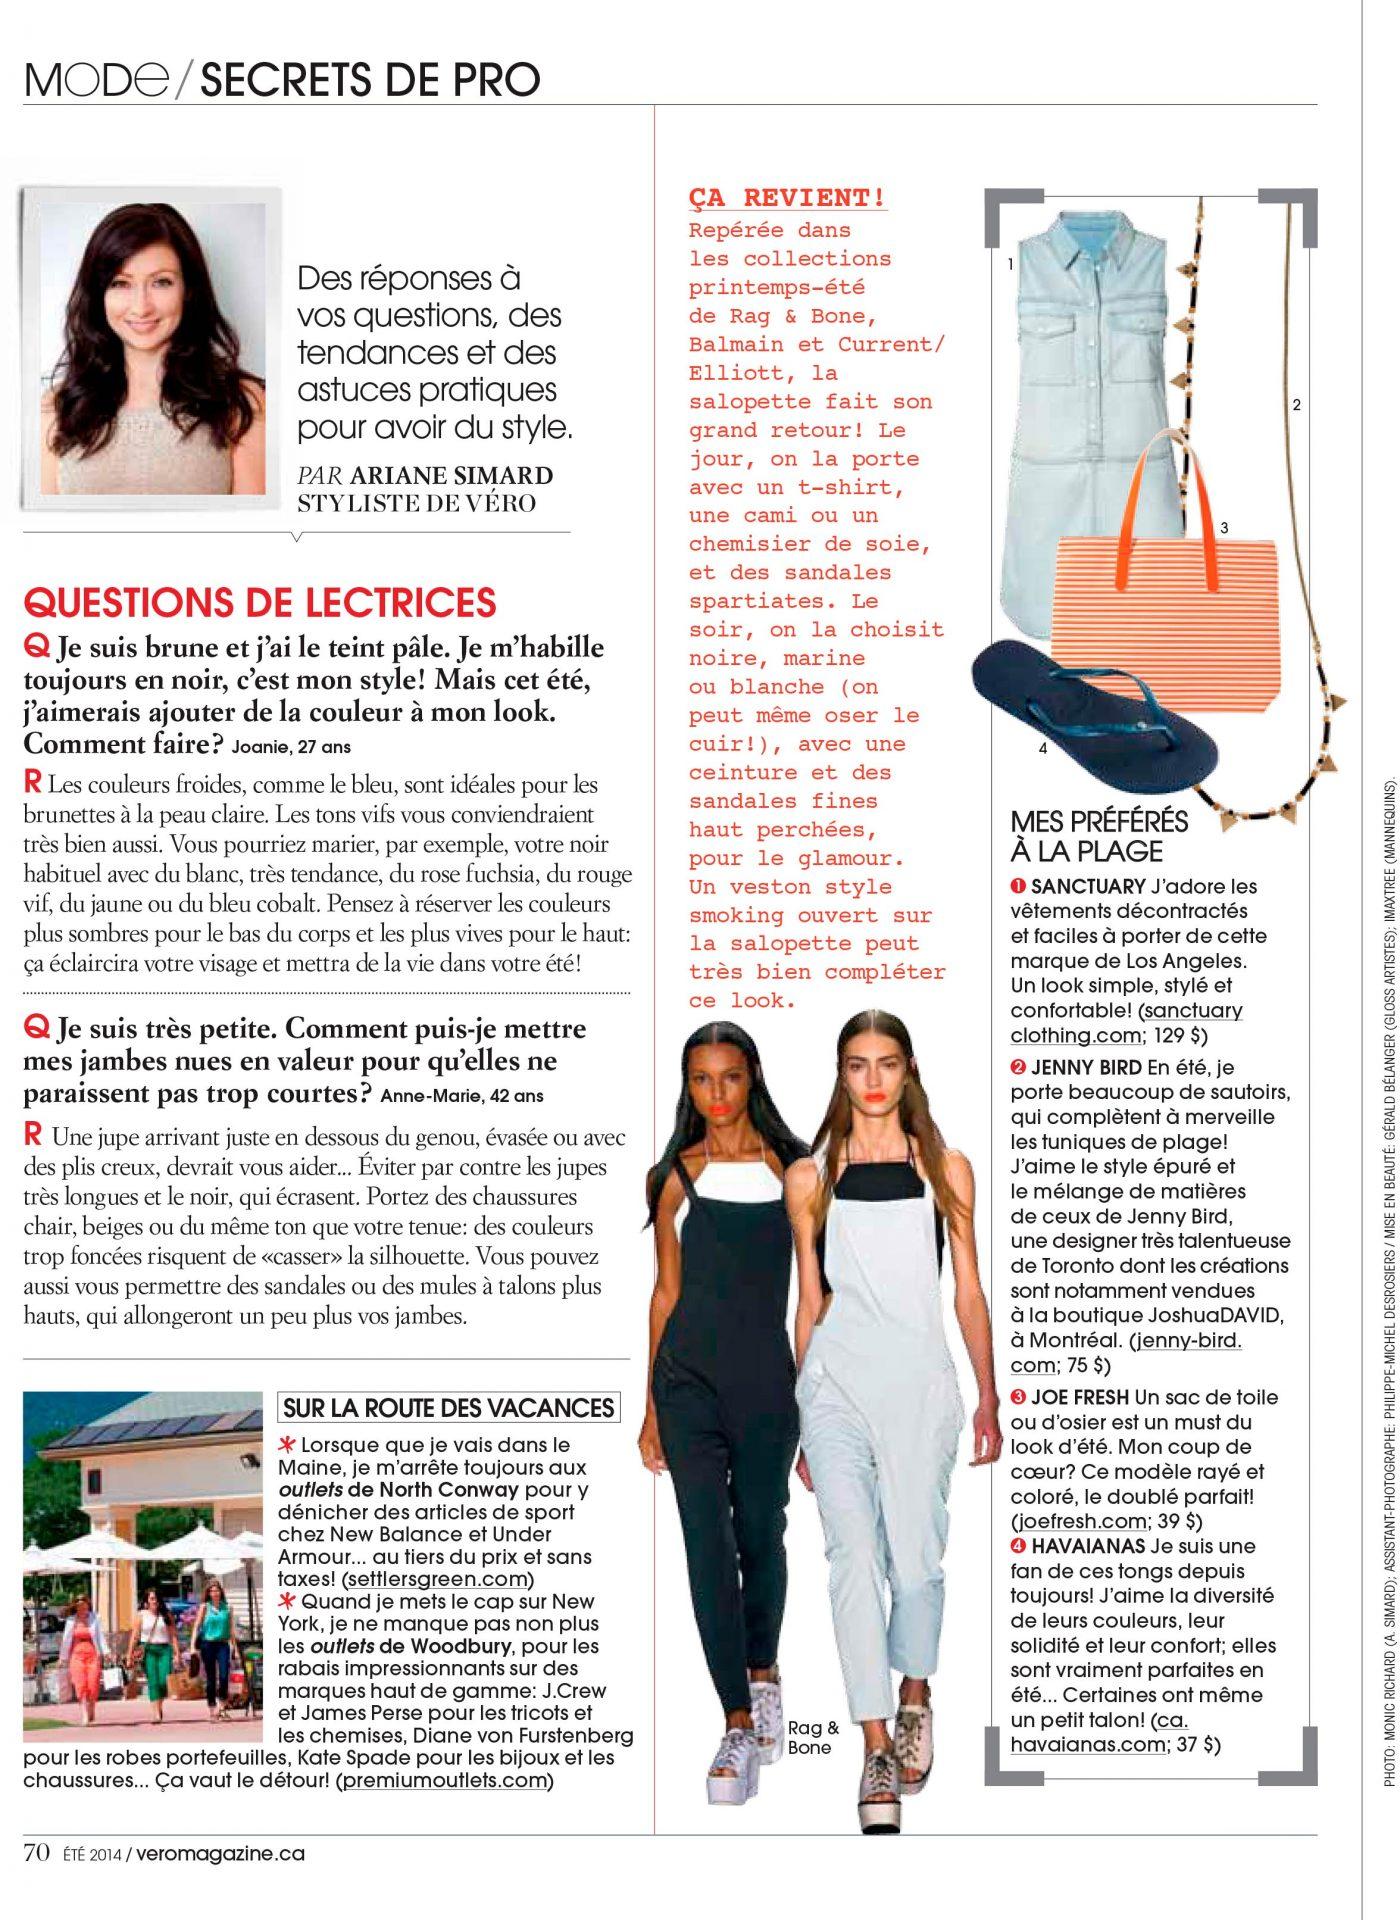 Secrets de pro Magazine Vero Ariane Simard Ete 2014